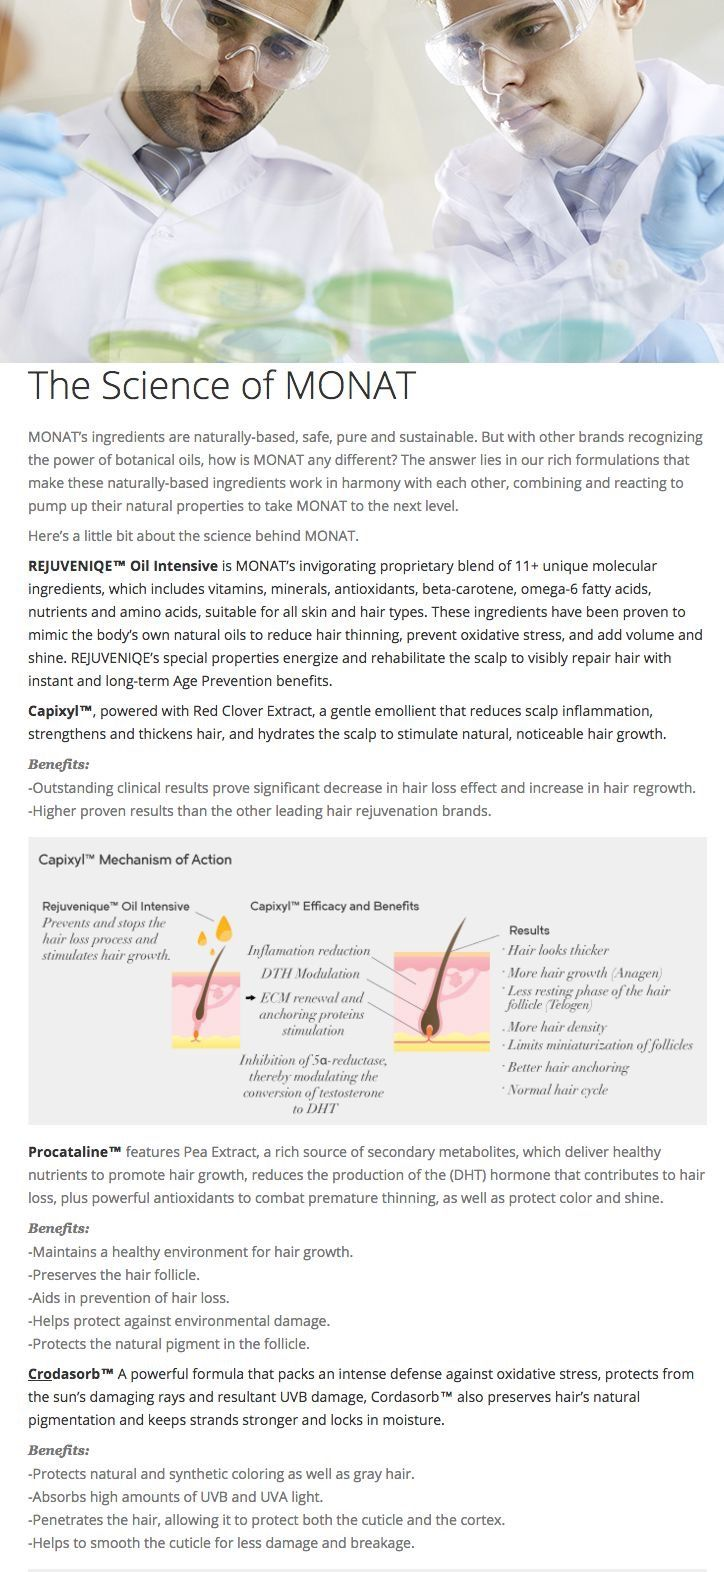 Science behind Monat Monat hair, Monat, Monat ingredients